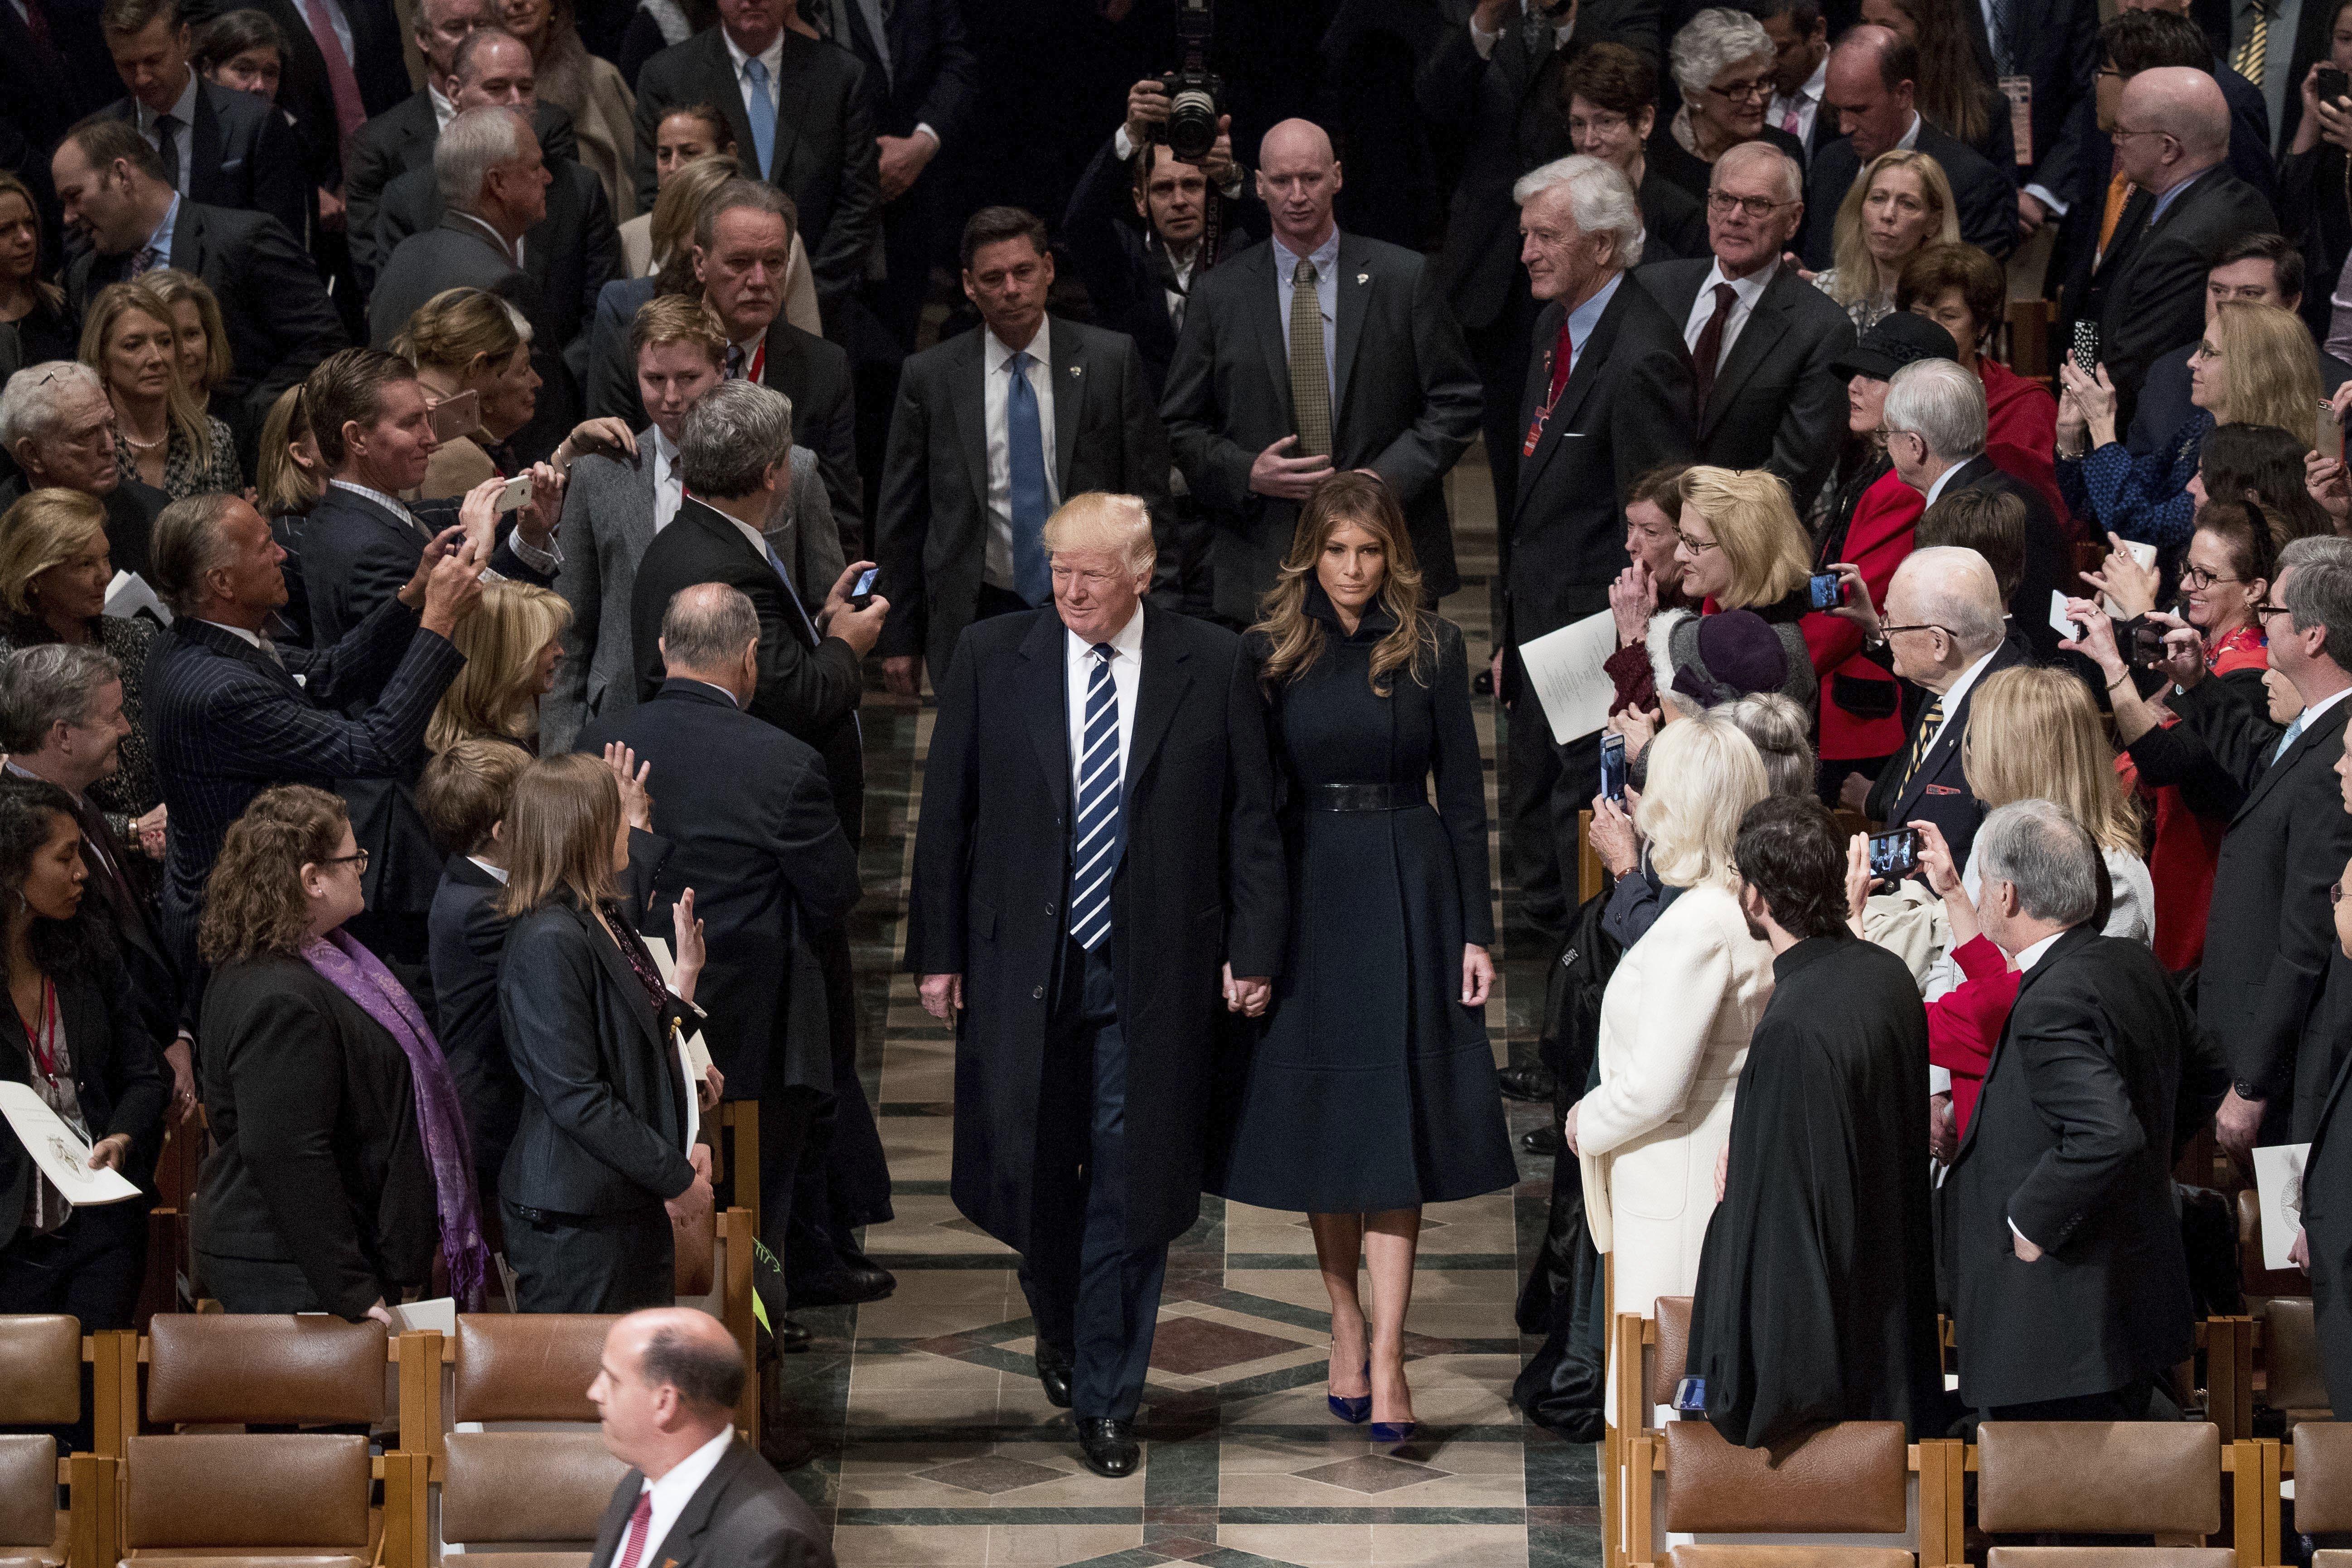 Trump Inauguration Gallery Donald Trump and Melania Trumpc